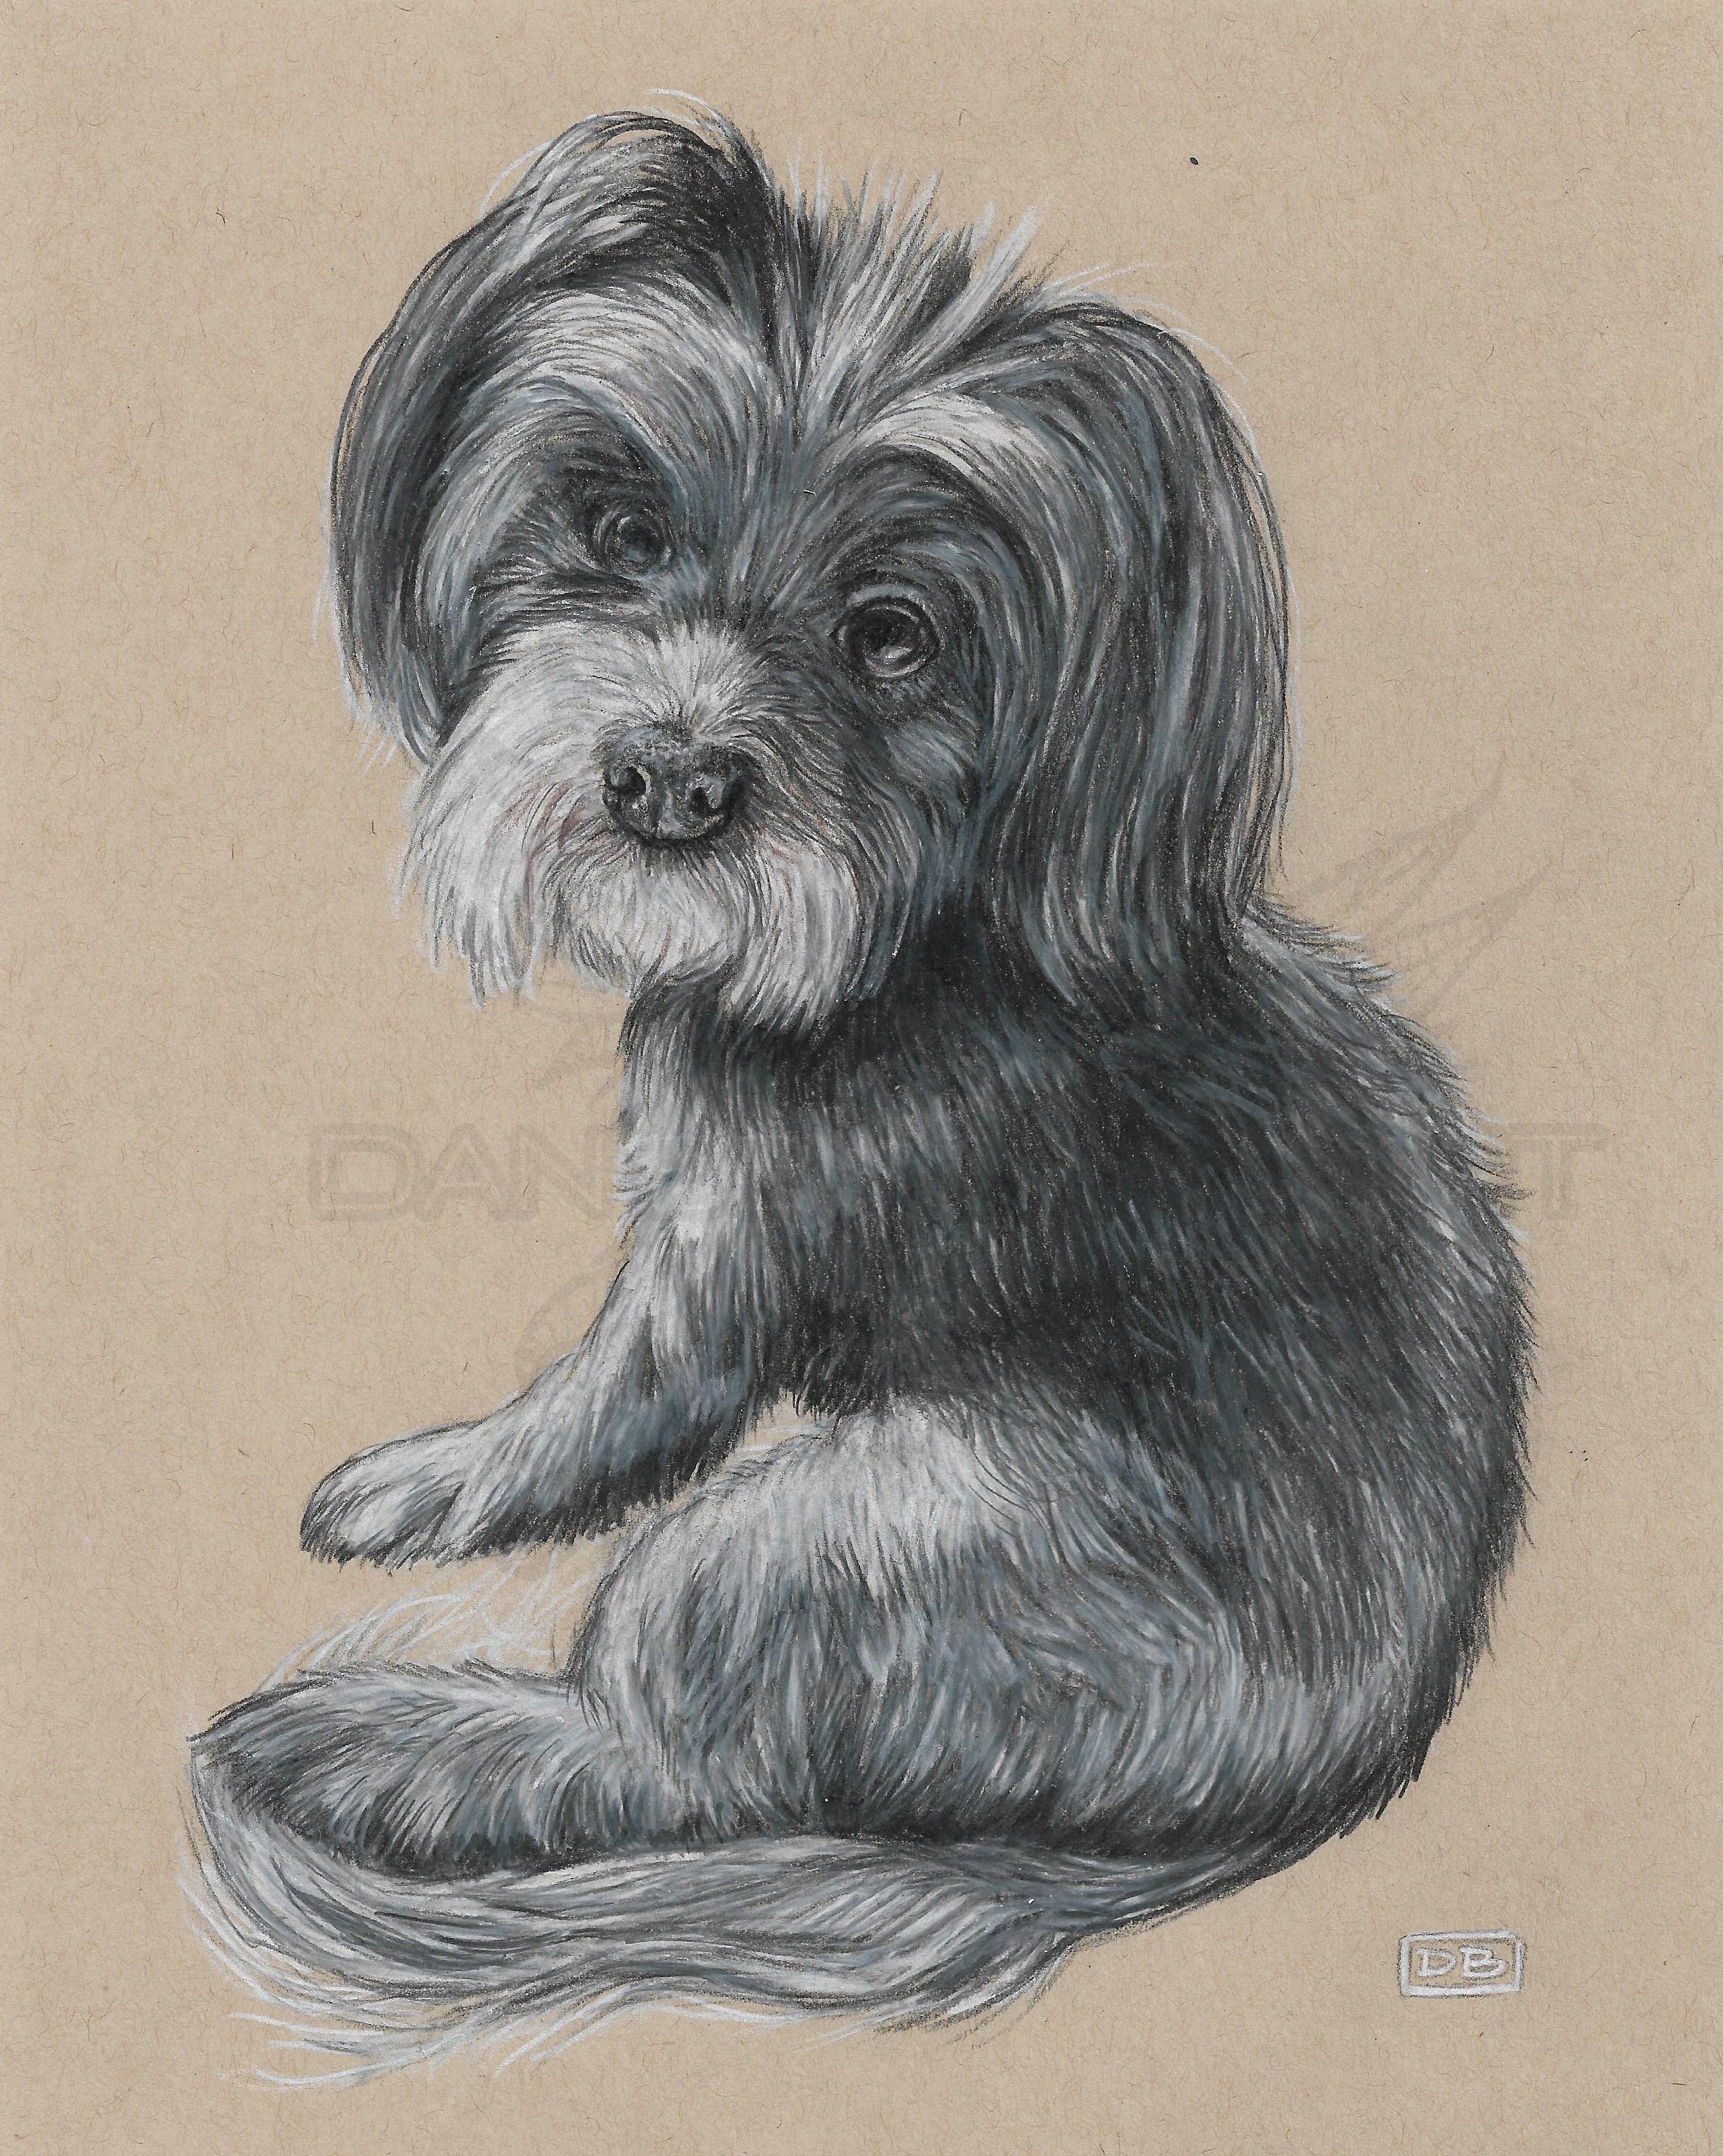 Willow Dog Portrait Commission